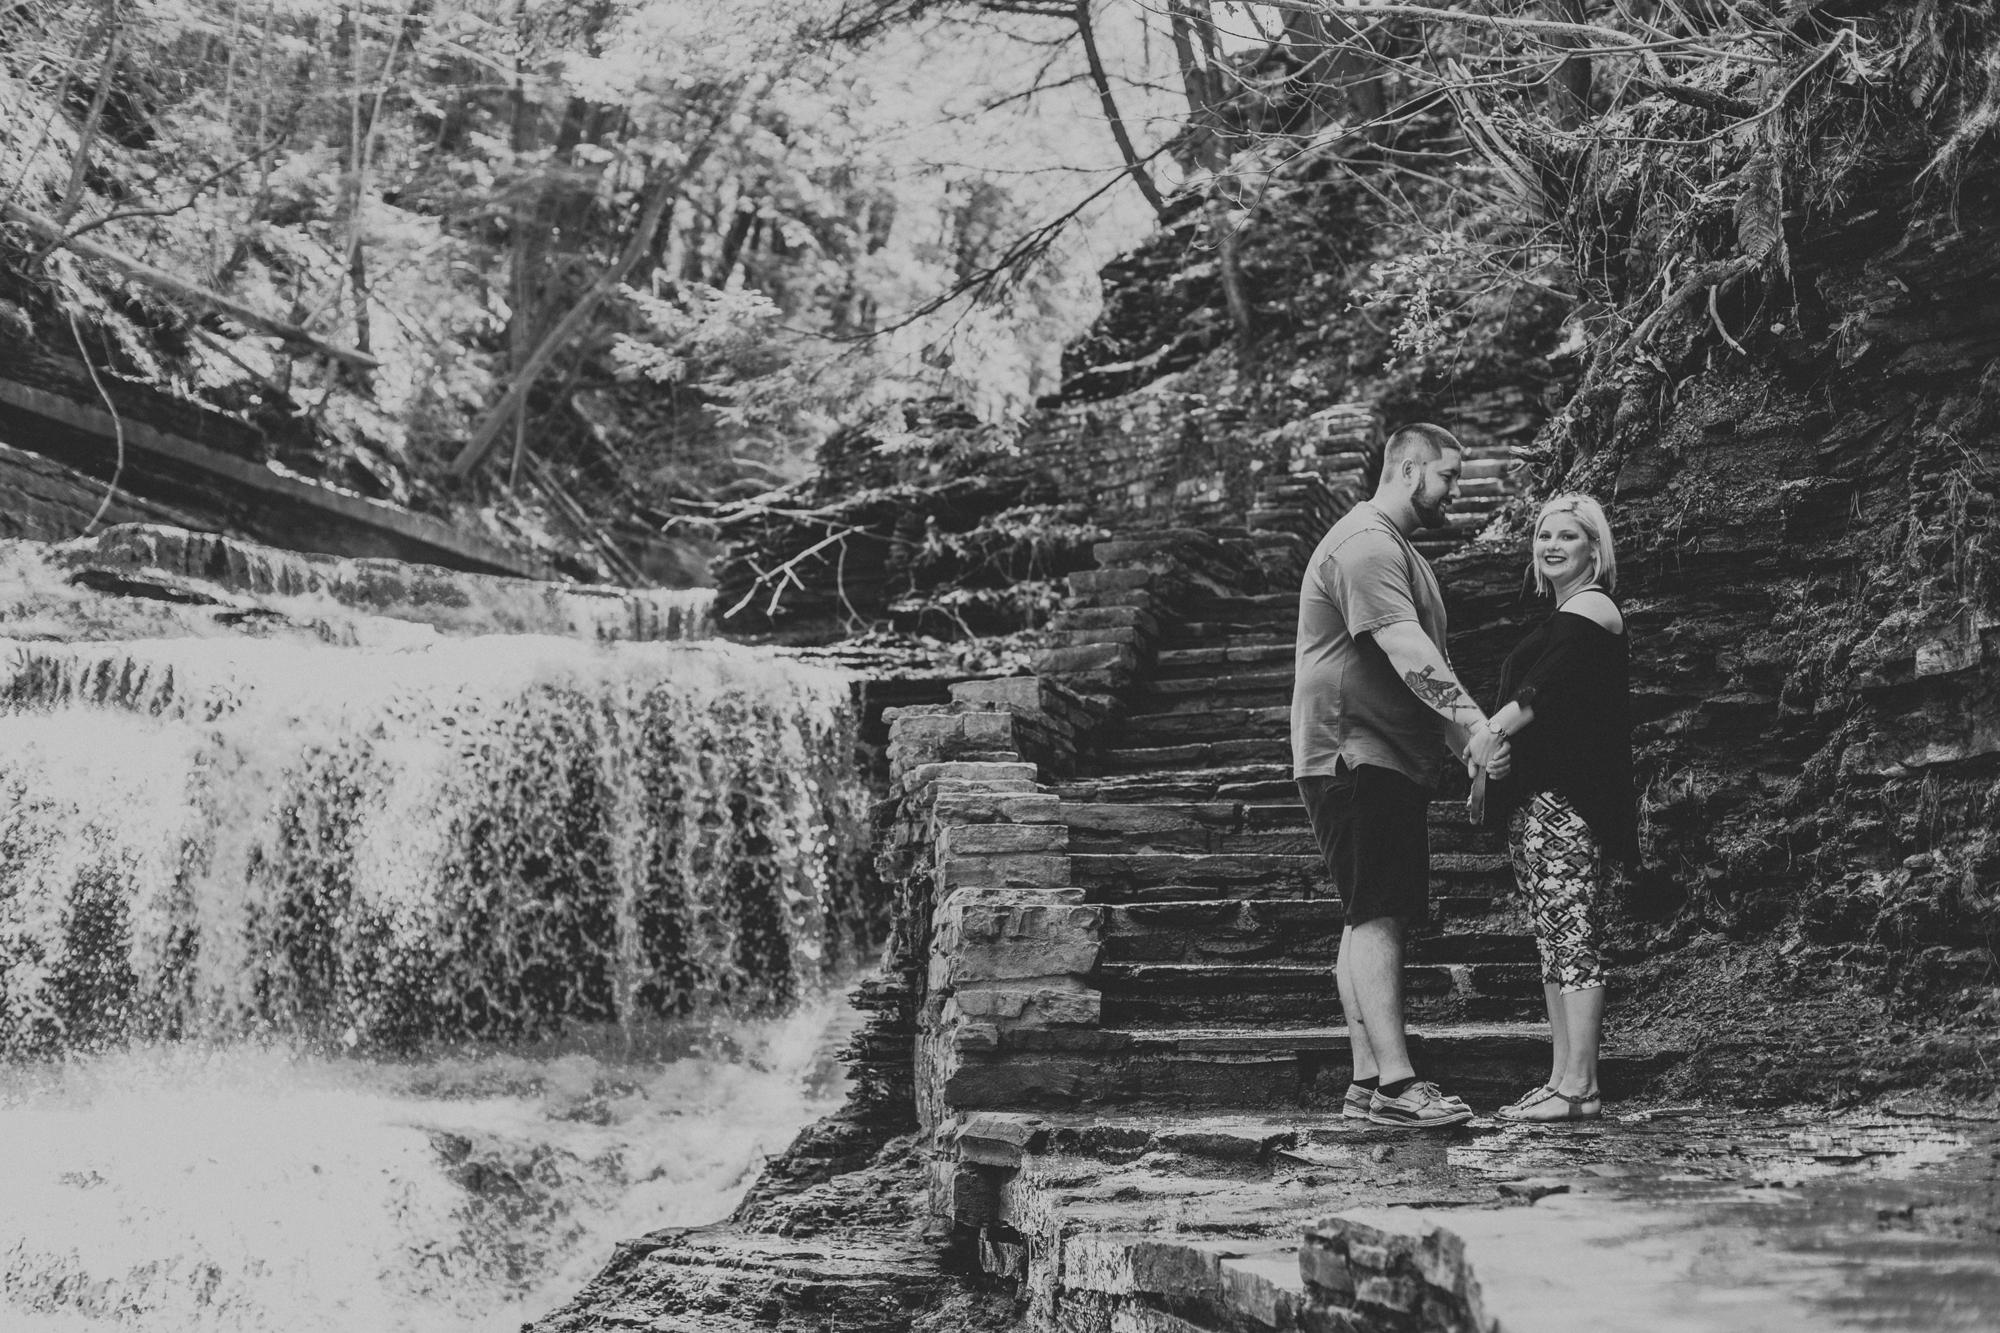 engagement-proposal-photography-buttermilk-falls